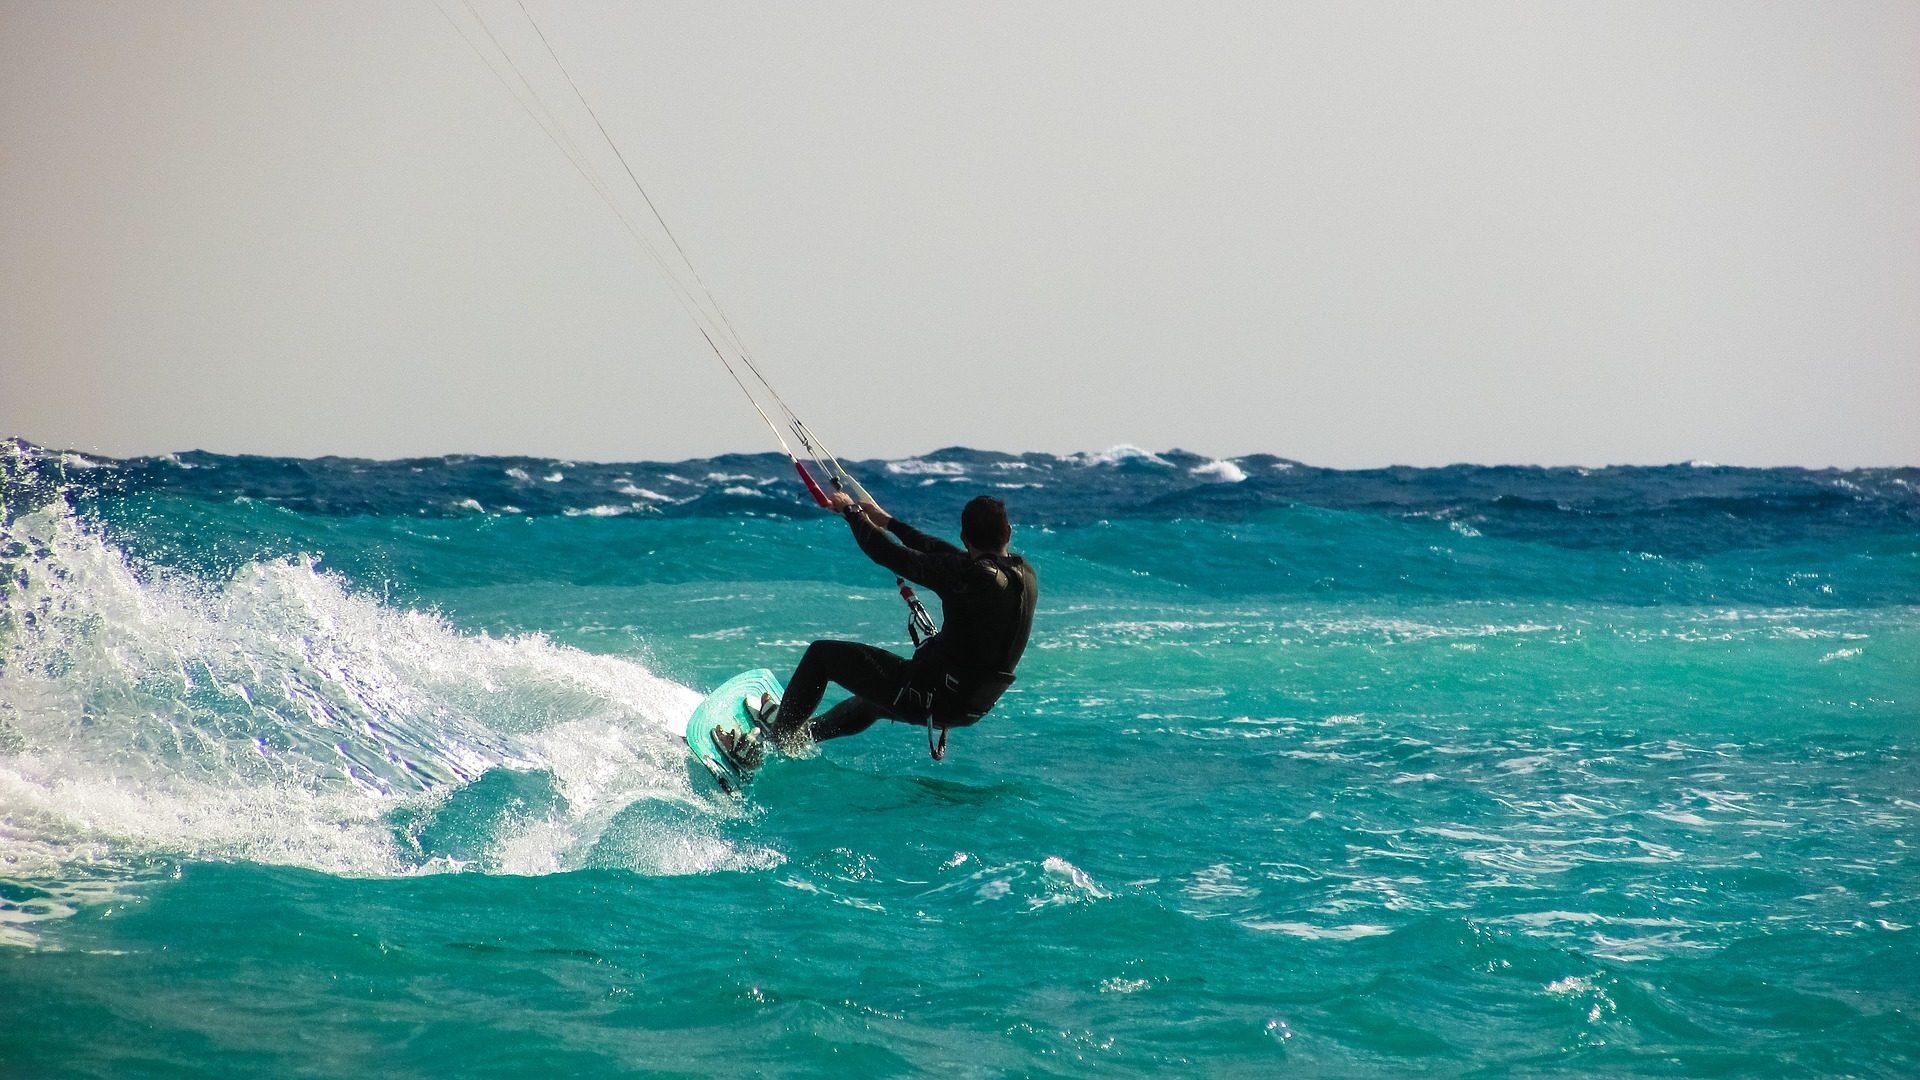 kite surfing, κύματα, Θάλασσα, Πίνακας, ο άνθρωπος, κινδύνου - Wallpapers HD - Professor-falken.com